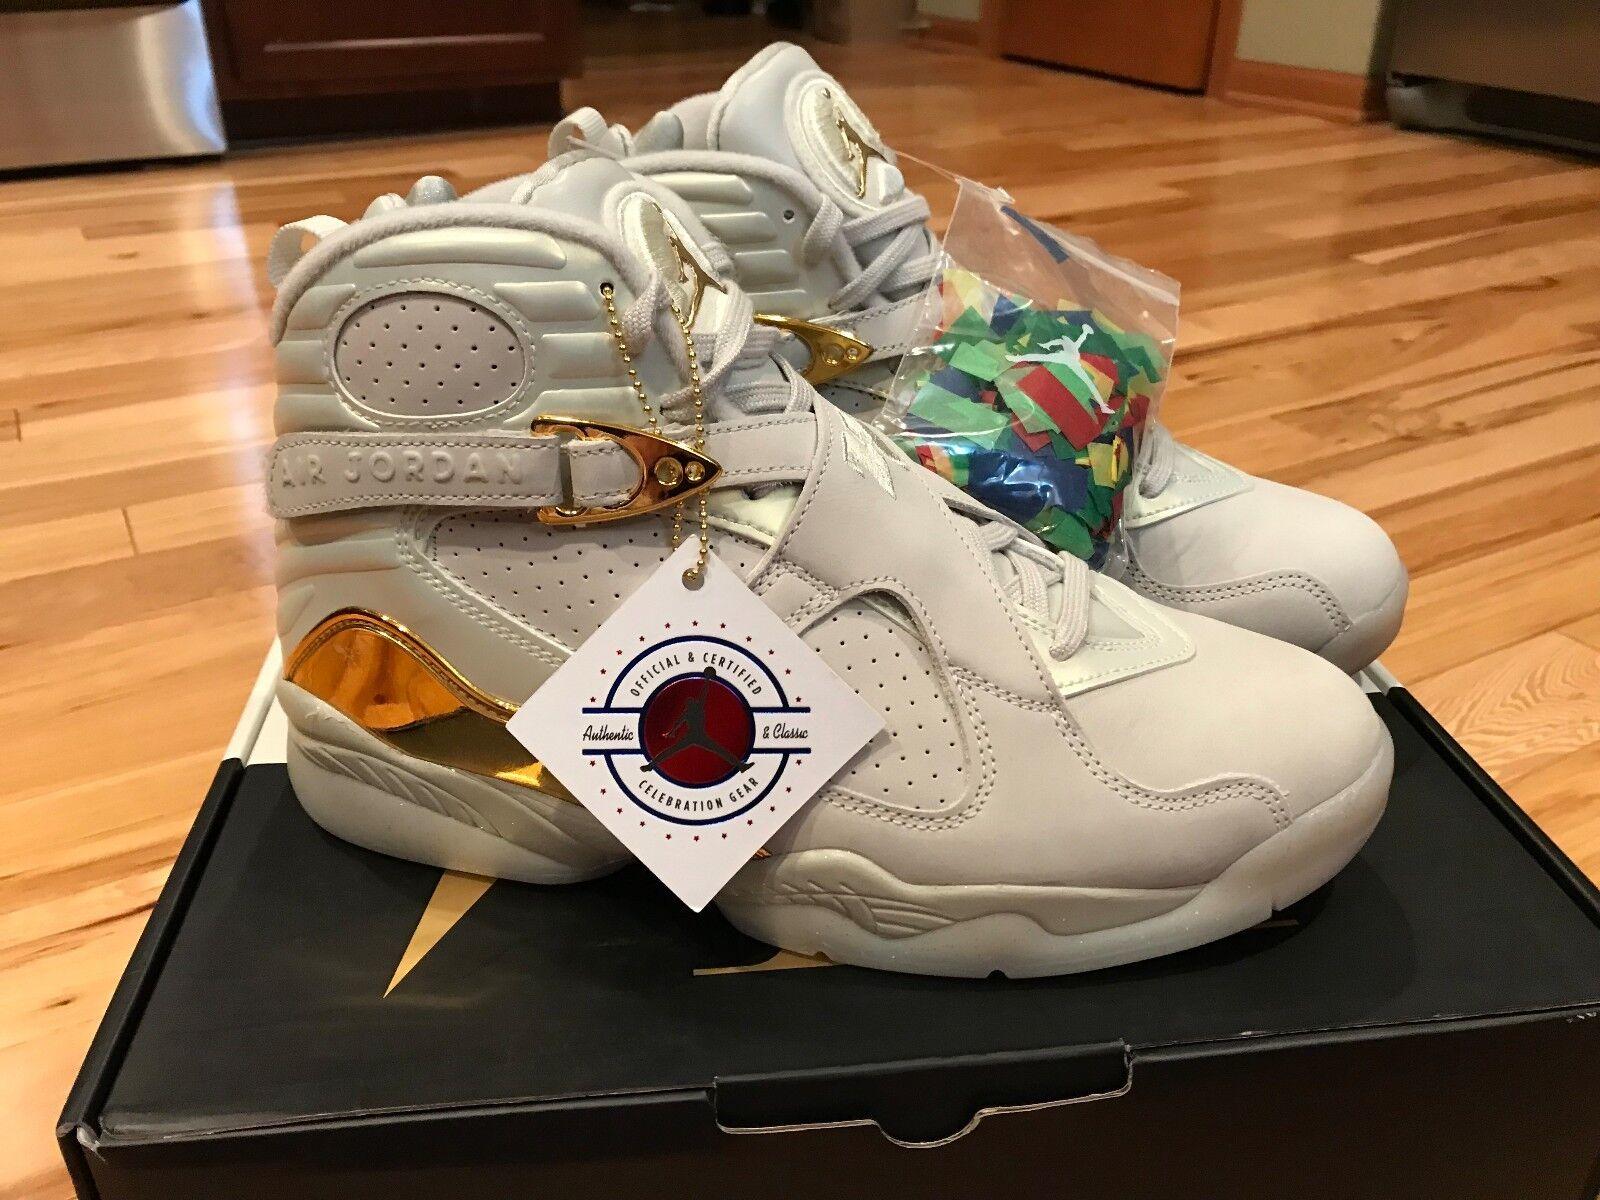 Nike air force 1 ultraforce crft uomini / casual scarpe nero / uomini bianco 5729e8